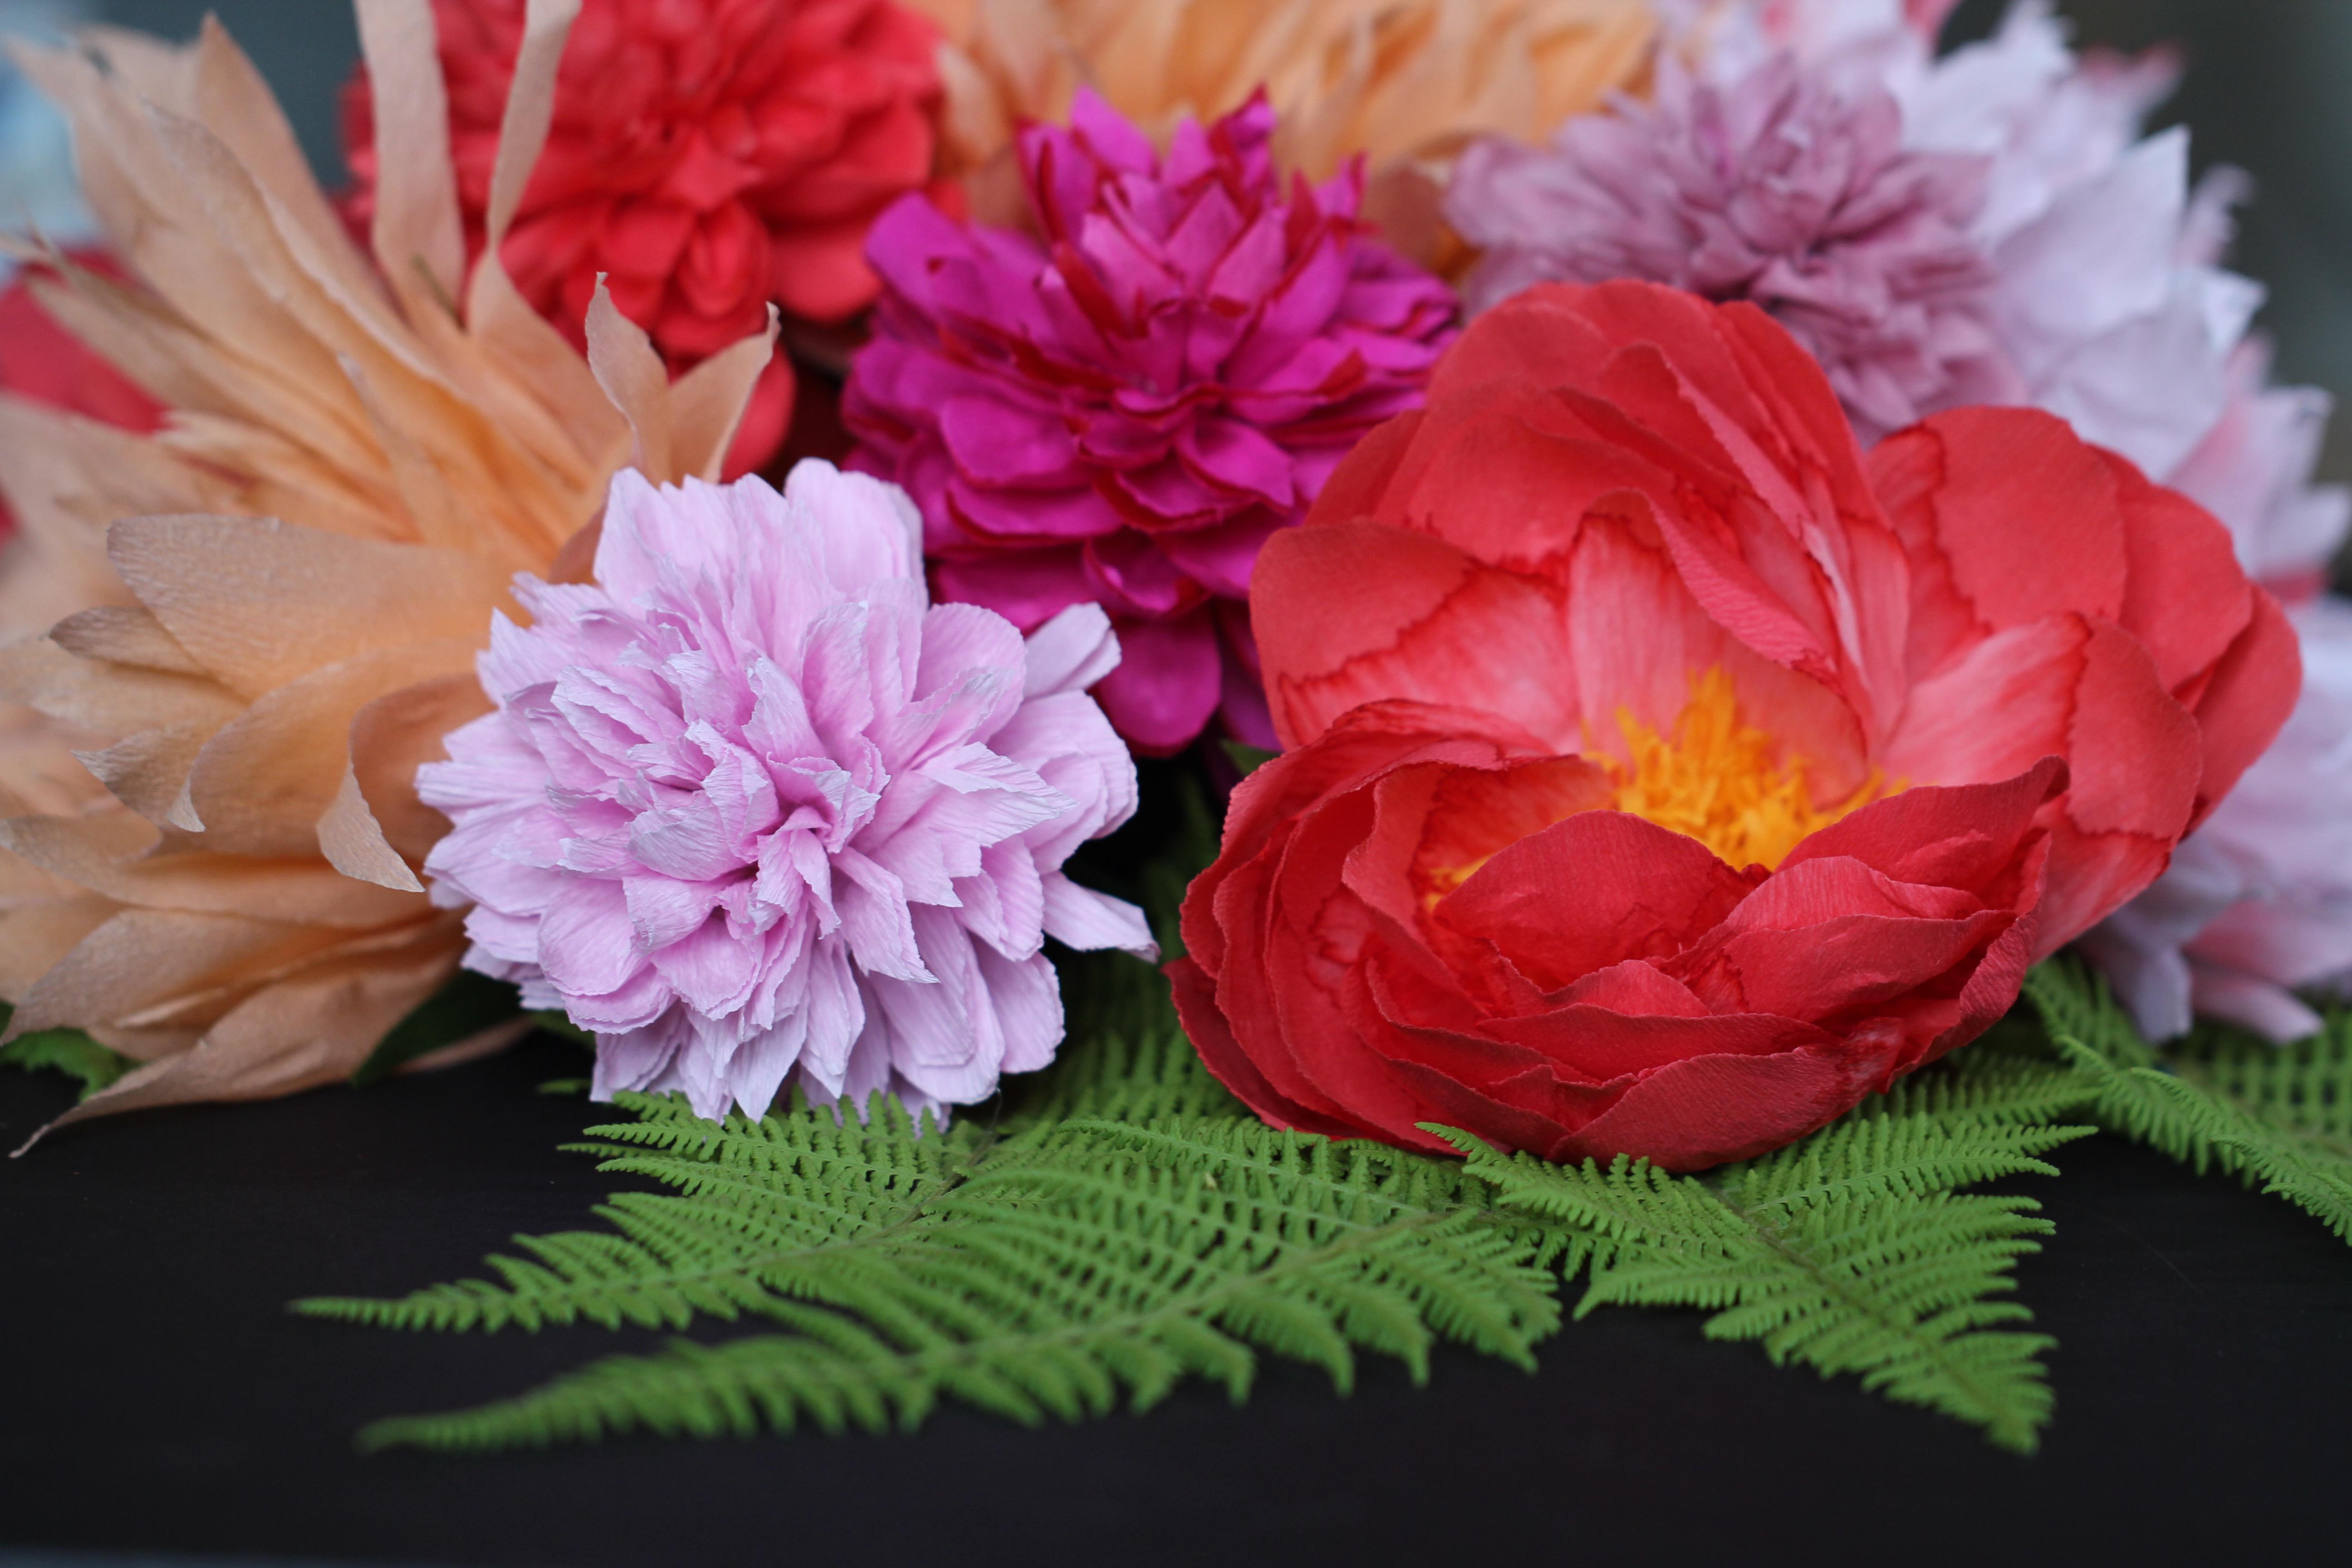 paper flower amity beane